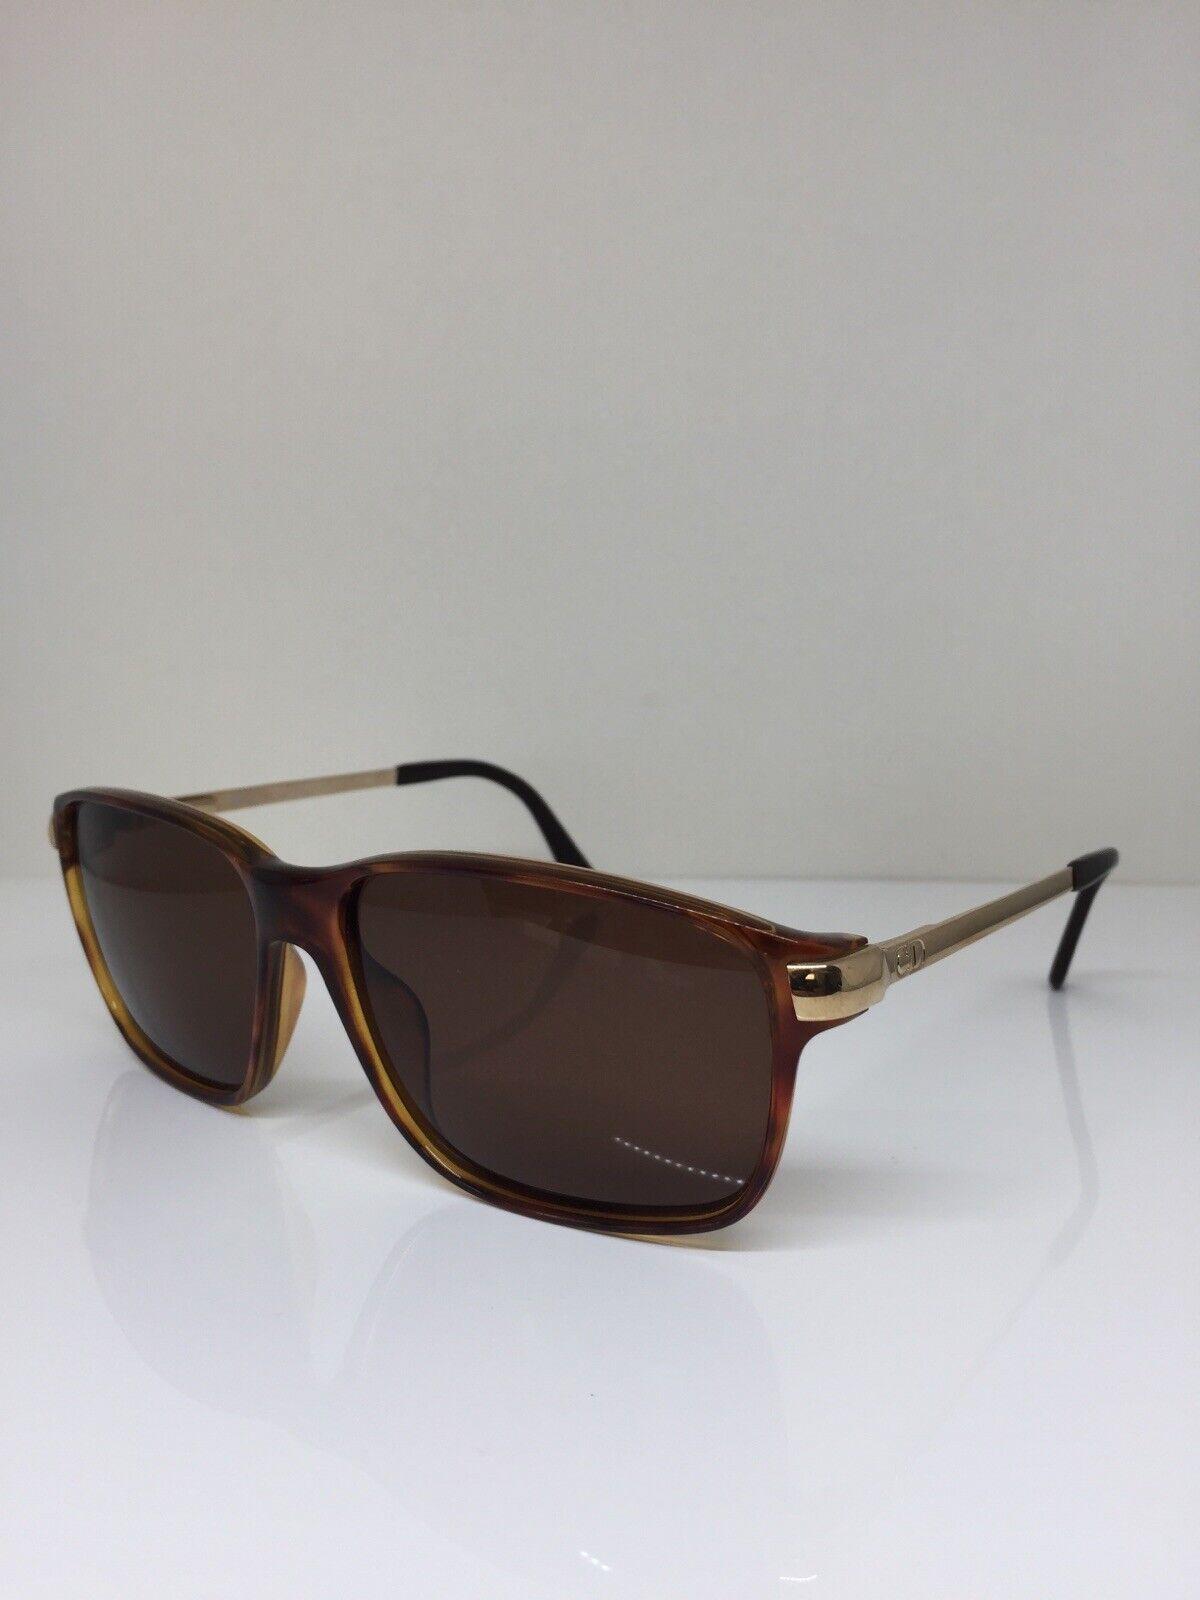 New Vintage Christian Dior 2902 Sunglasses C. 10 Brown w/ Gold 58-14mm Austria